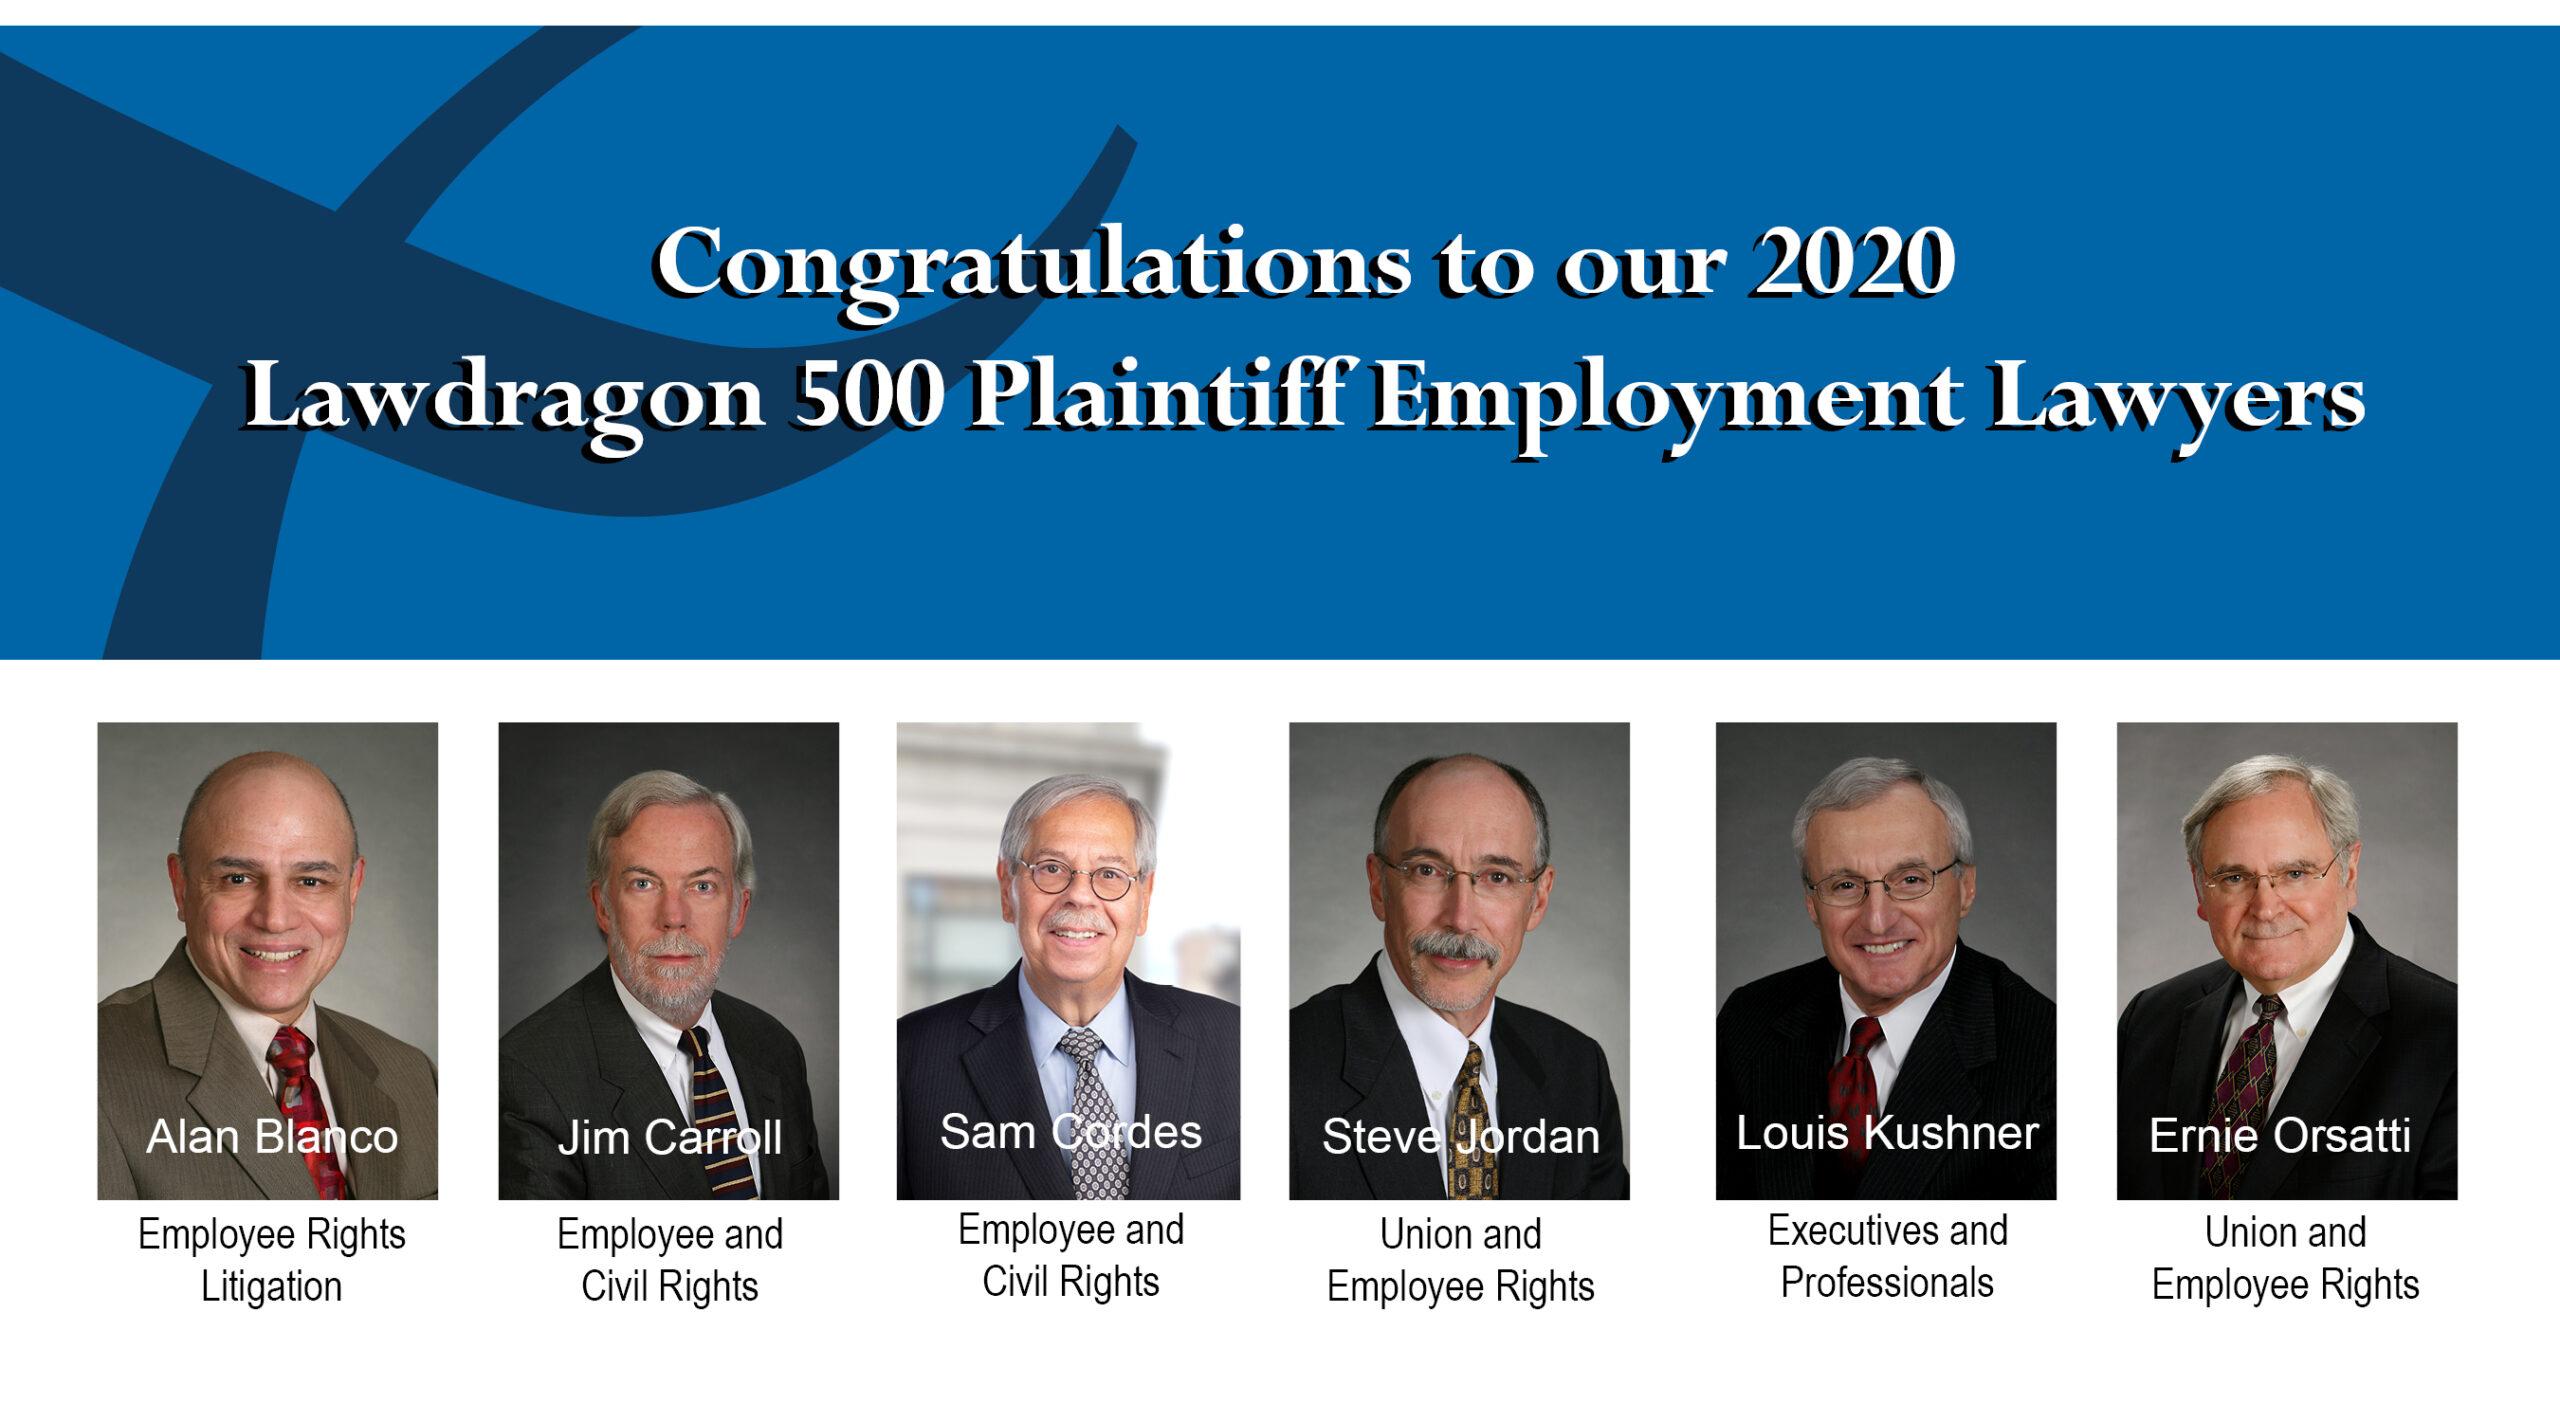 lawdragon congratulatory image